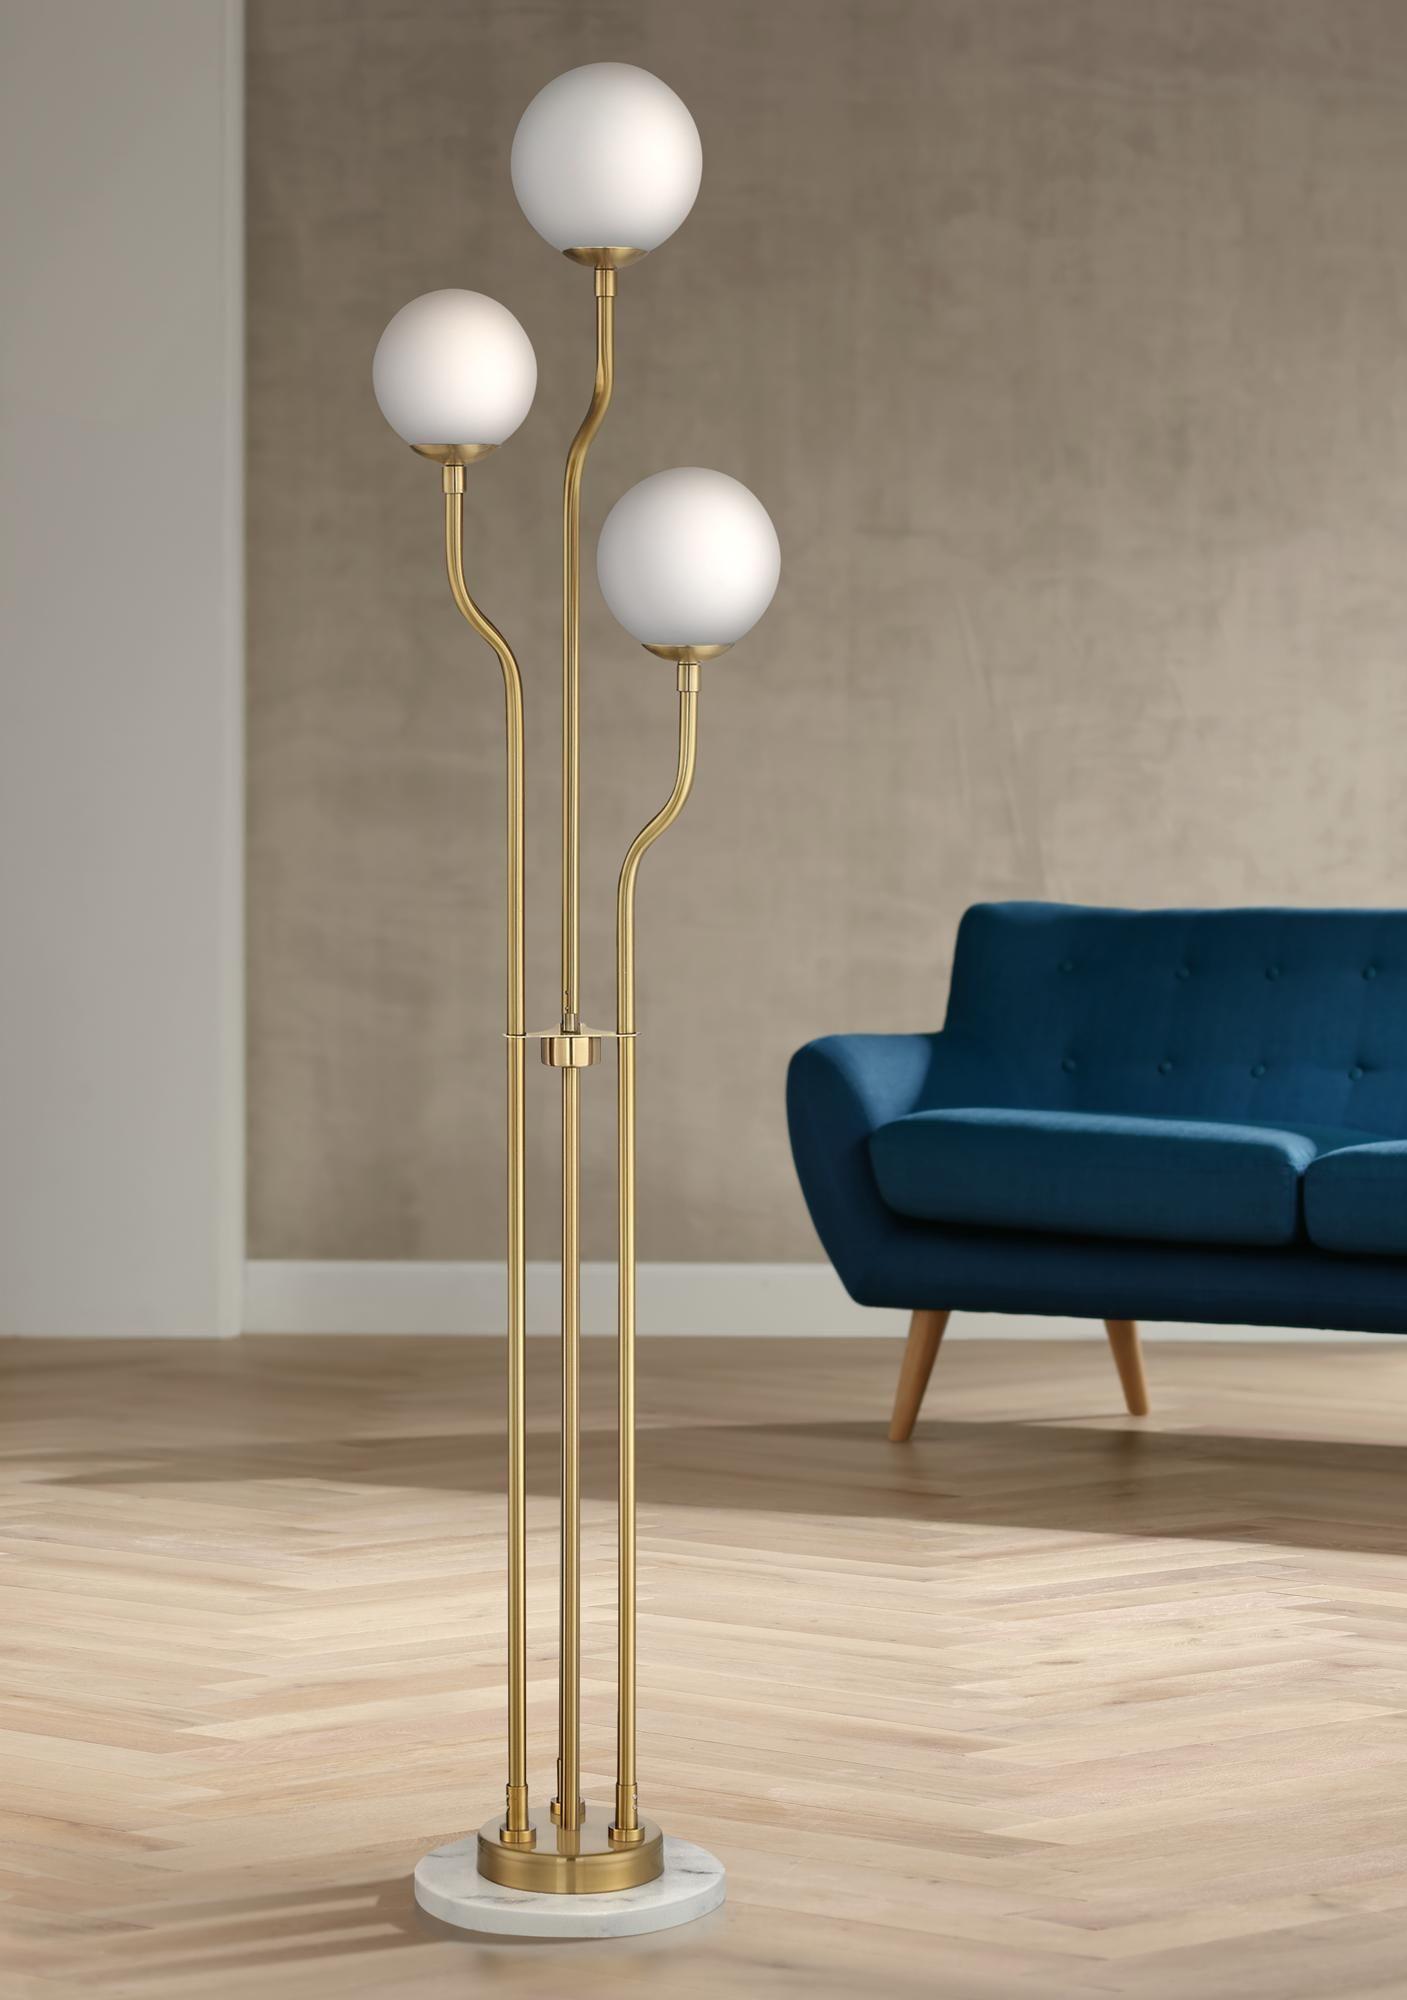 Floor Lamps Lite Source Parley Brass White Glass 3 Light Floor Lamp In 2020 White Floor Lamp Floor Lamp Styles Globe Floor Lamp